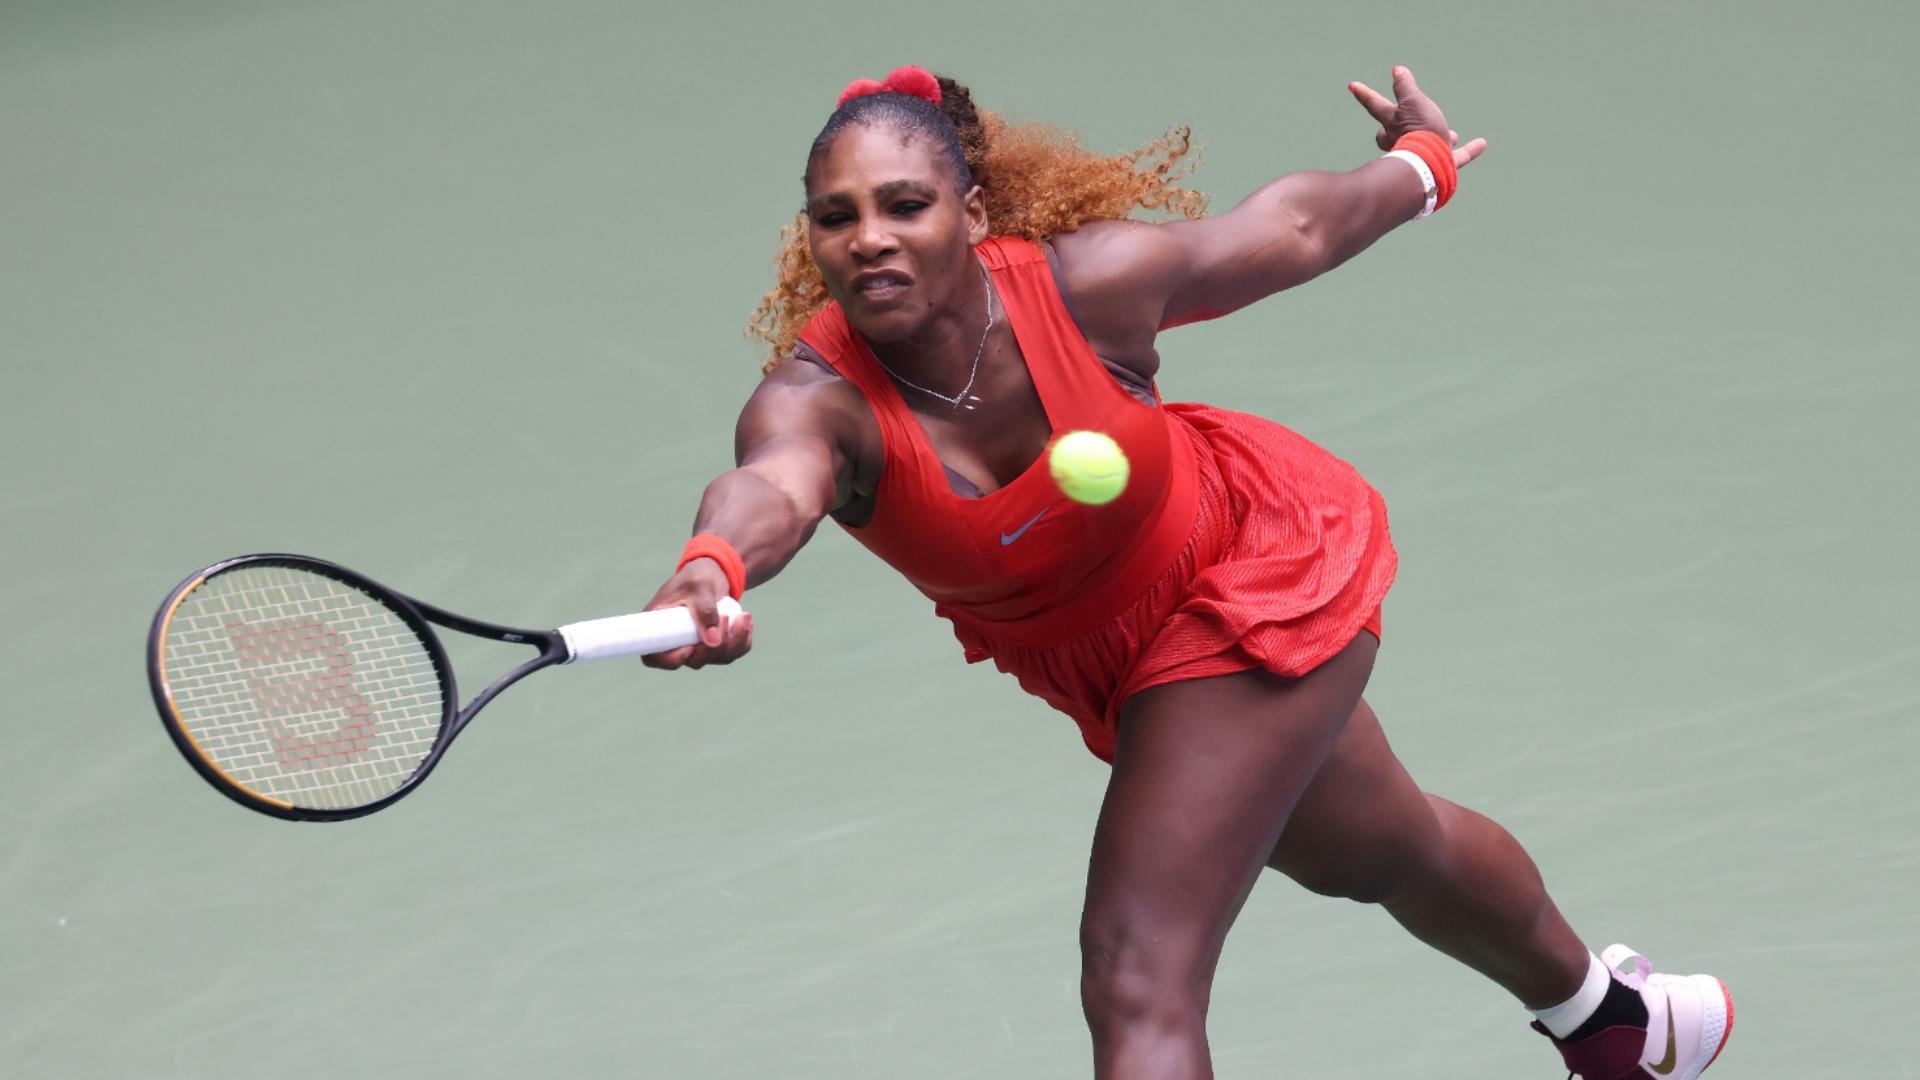 US Open 2020: Serena Williams rallies to halt Tsvetana Pironkova fairytale and reach semis